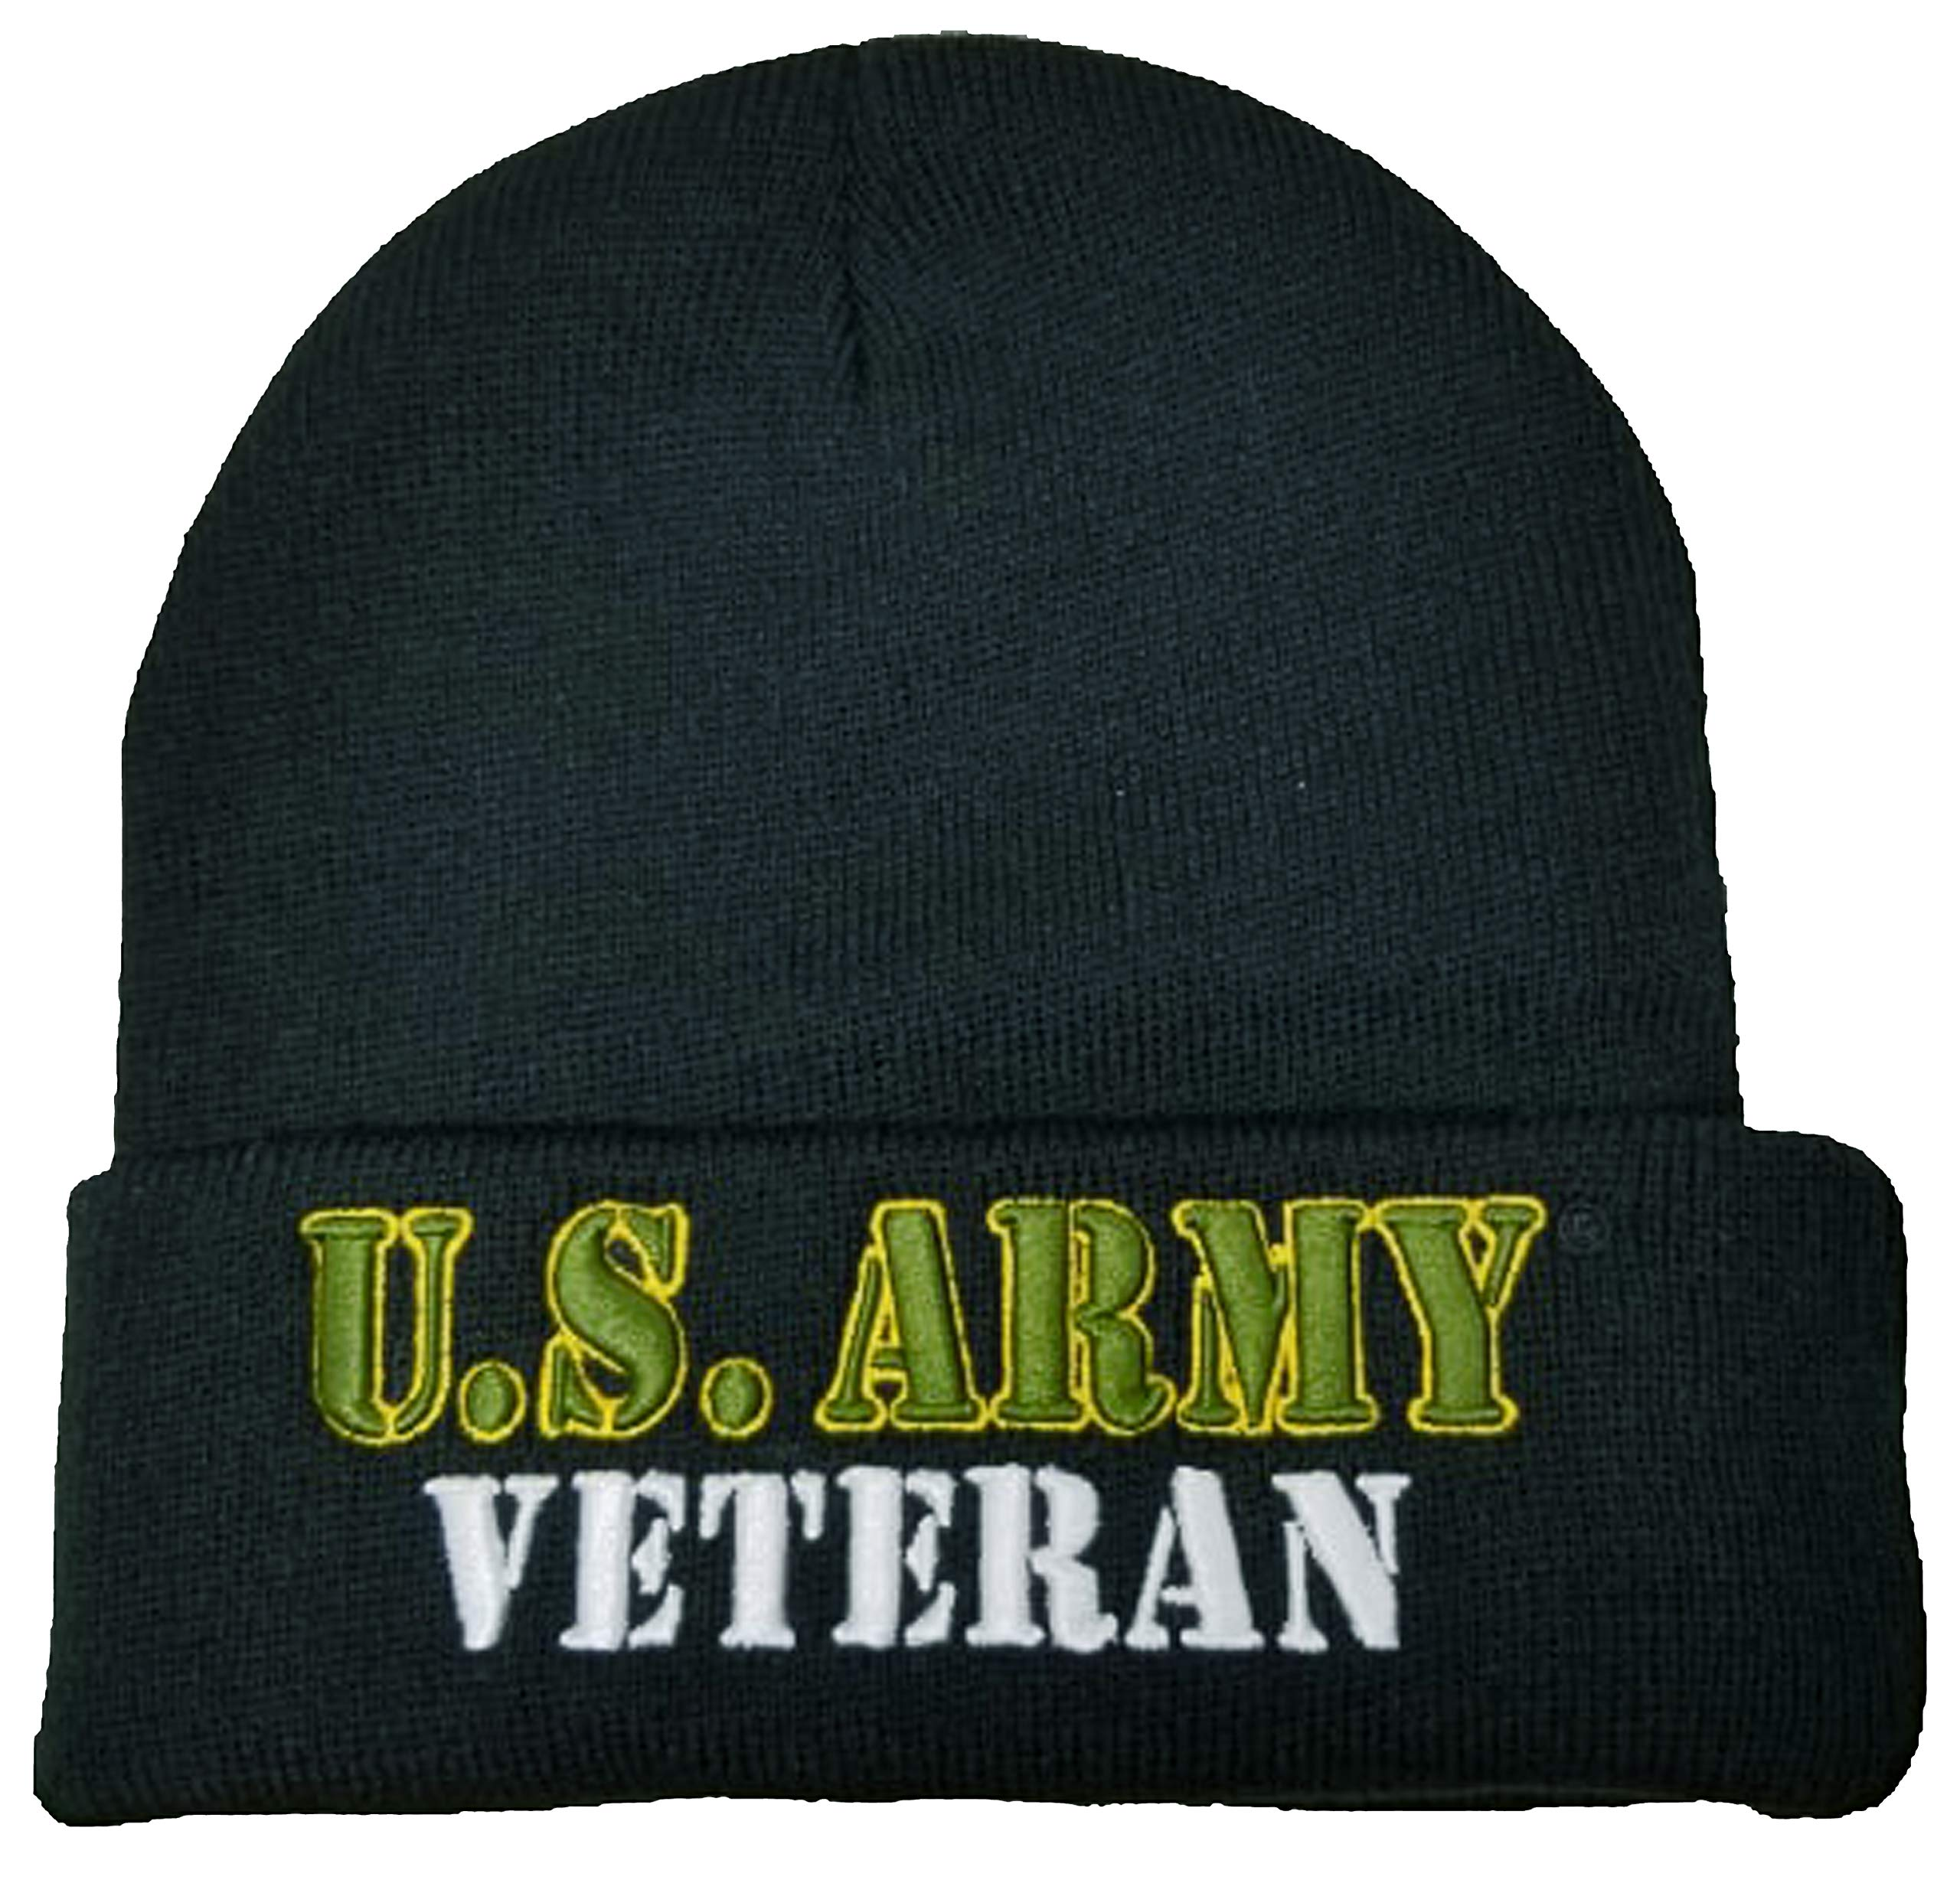 NEW US MILITARY DISABLED VIETNAM VETERAN BEANIE CAP HAT BLACK